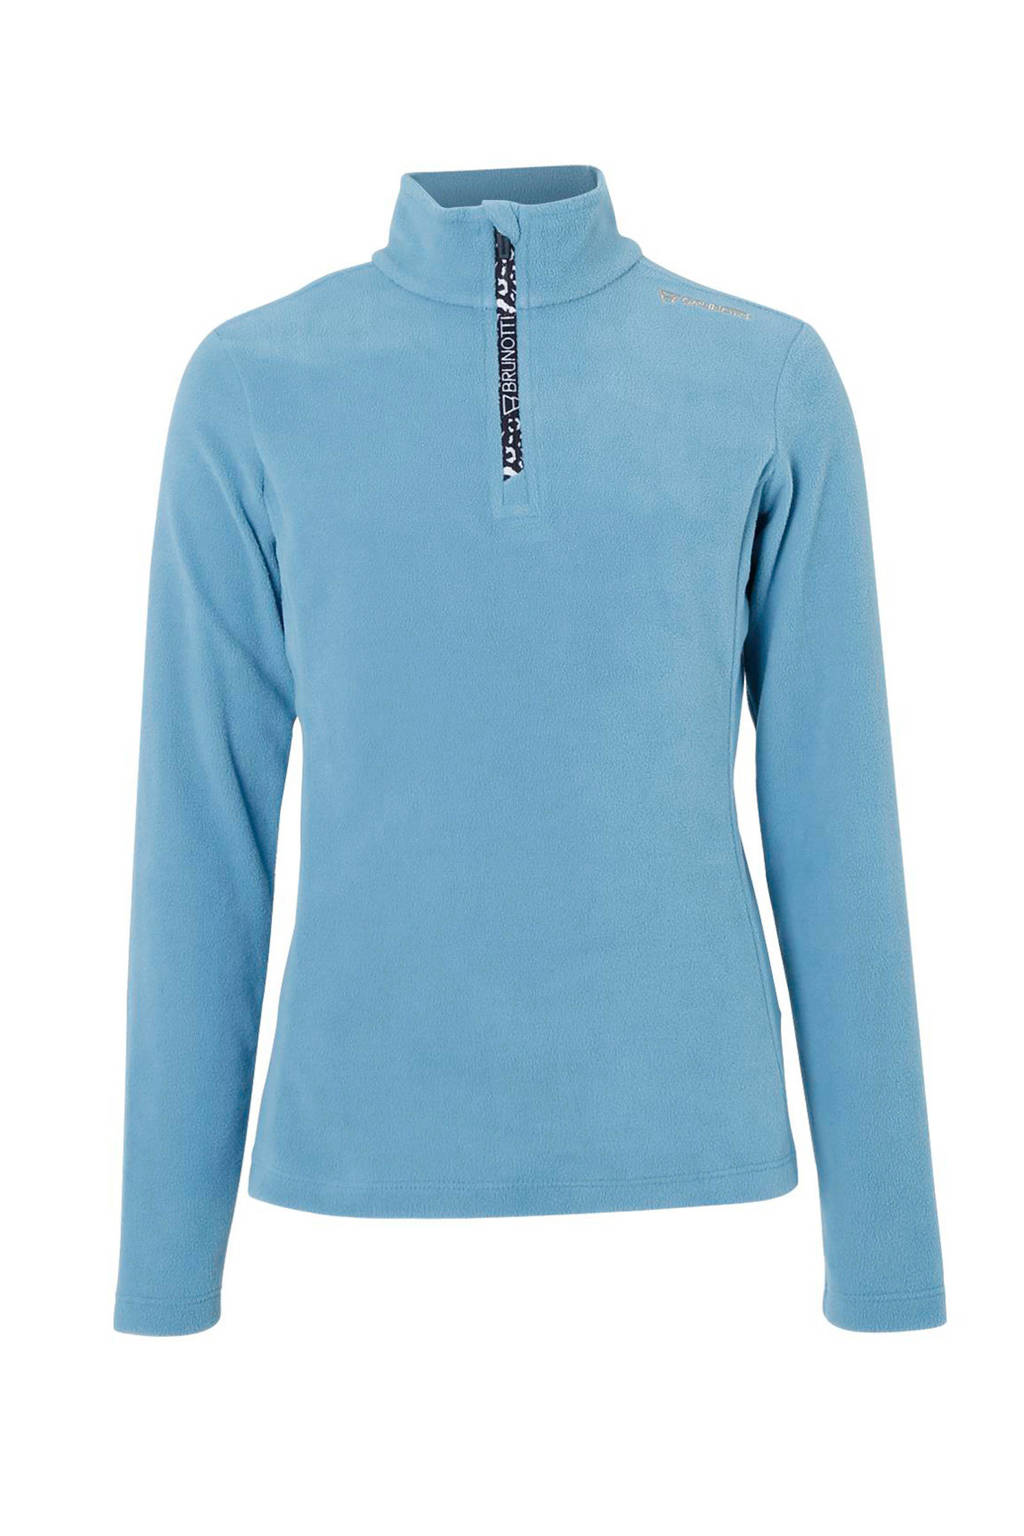 Brunotti fleece skipully Mismy blauw, Blauw